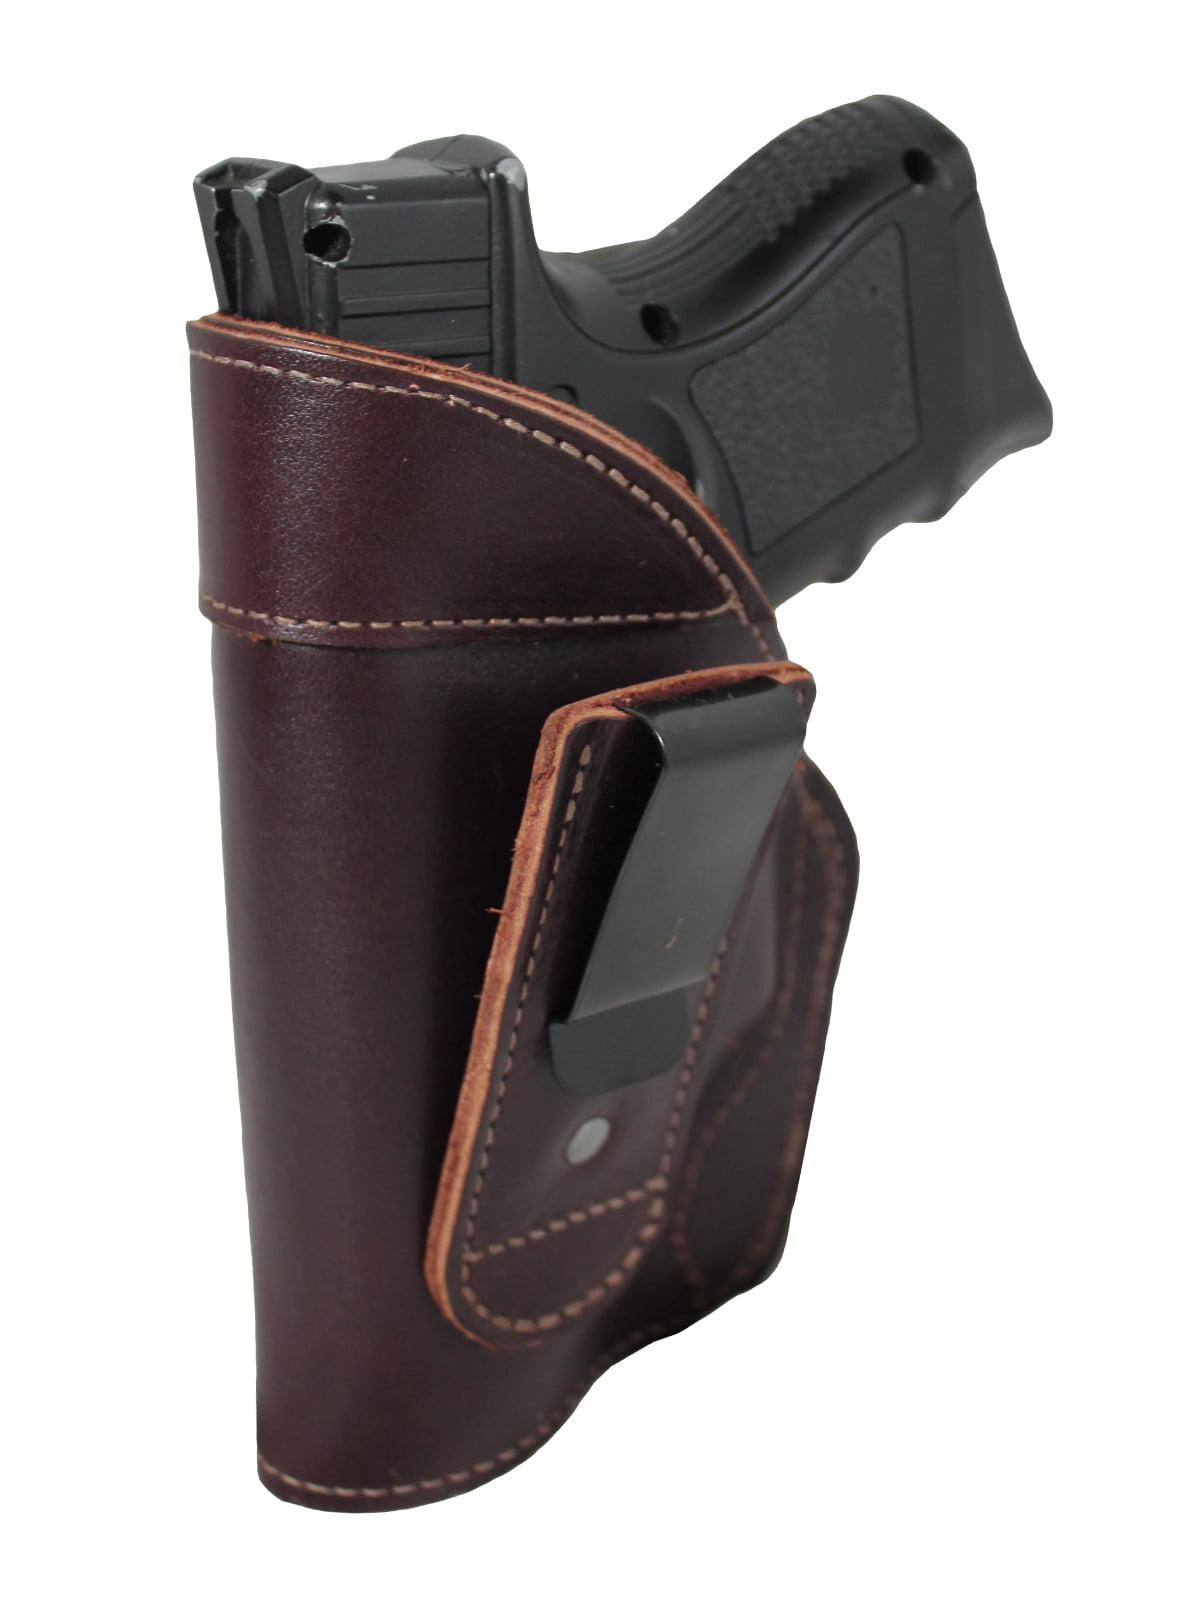 NEW Barsony Burgundy Leather IWB Gun Holster for Glock Compact 9mm 40 45